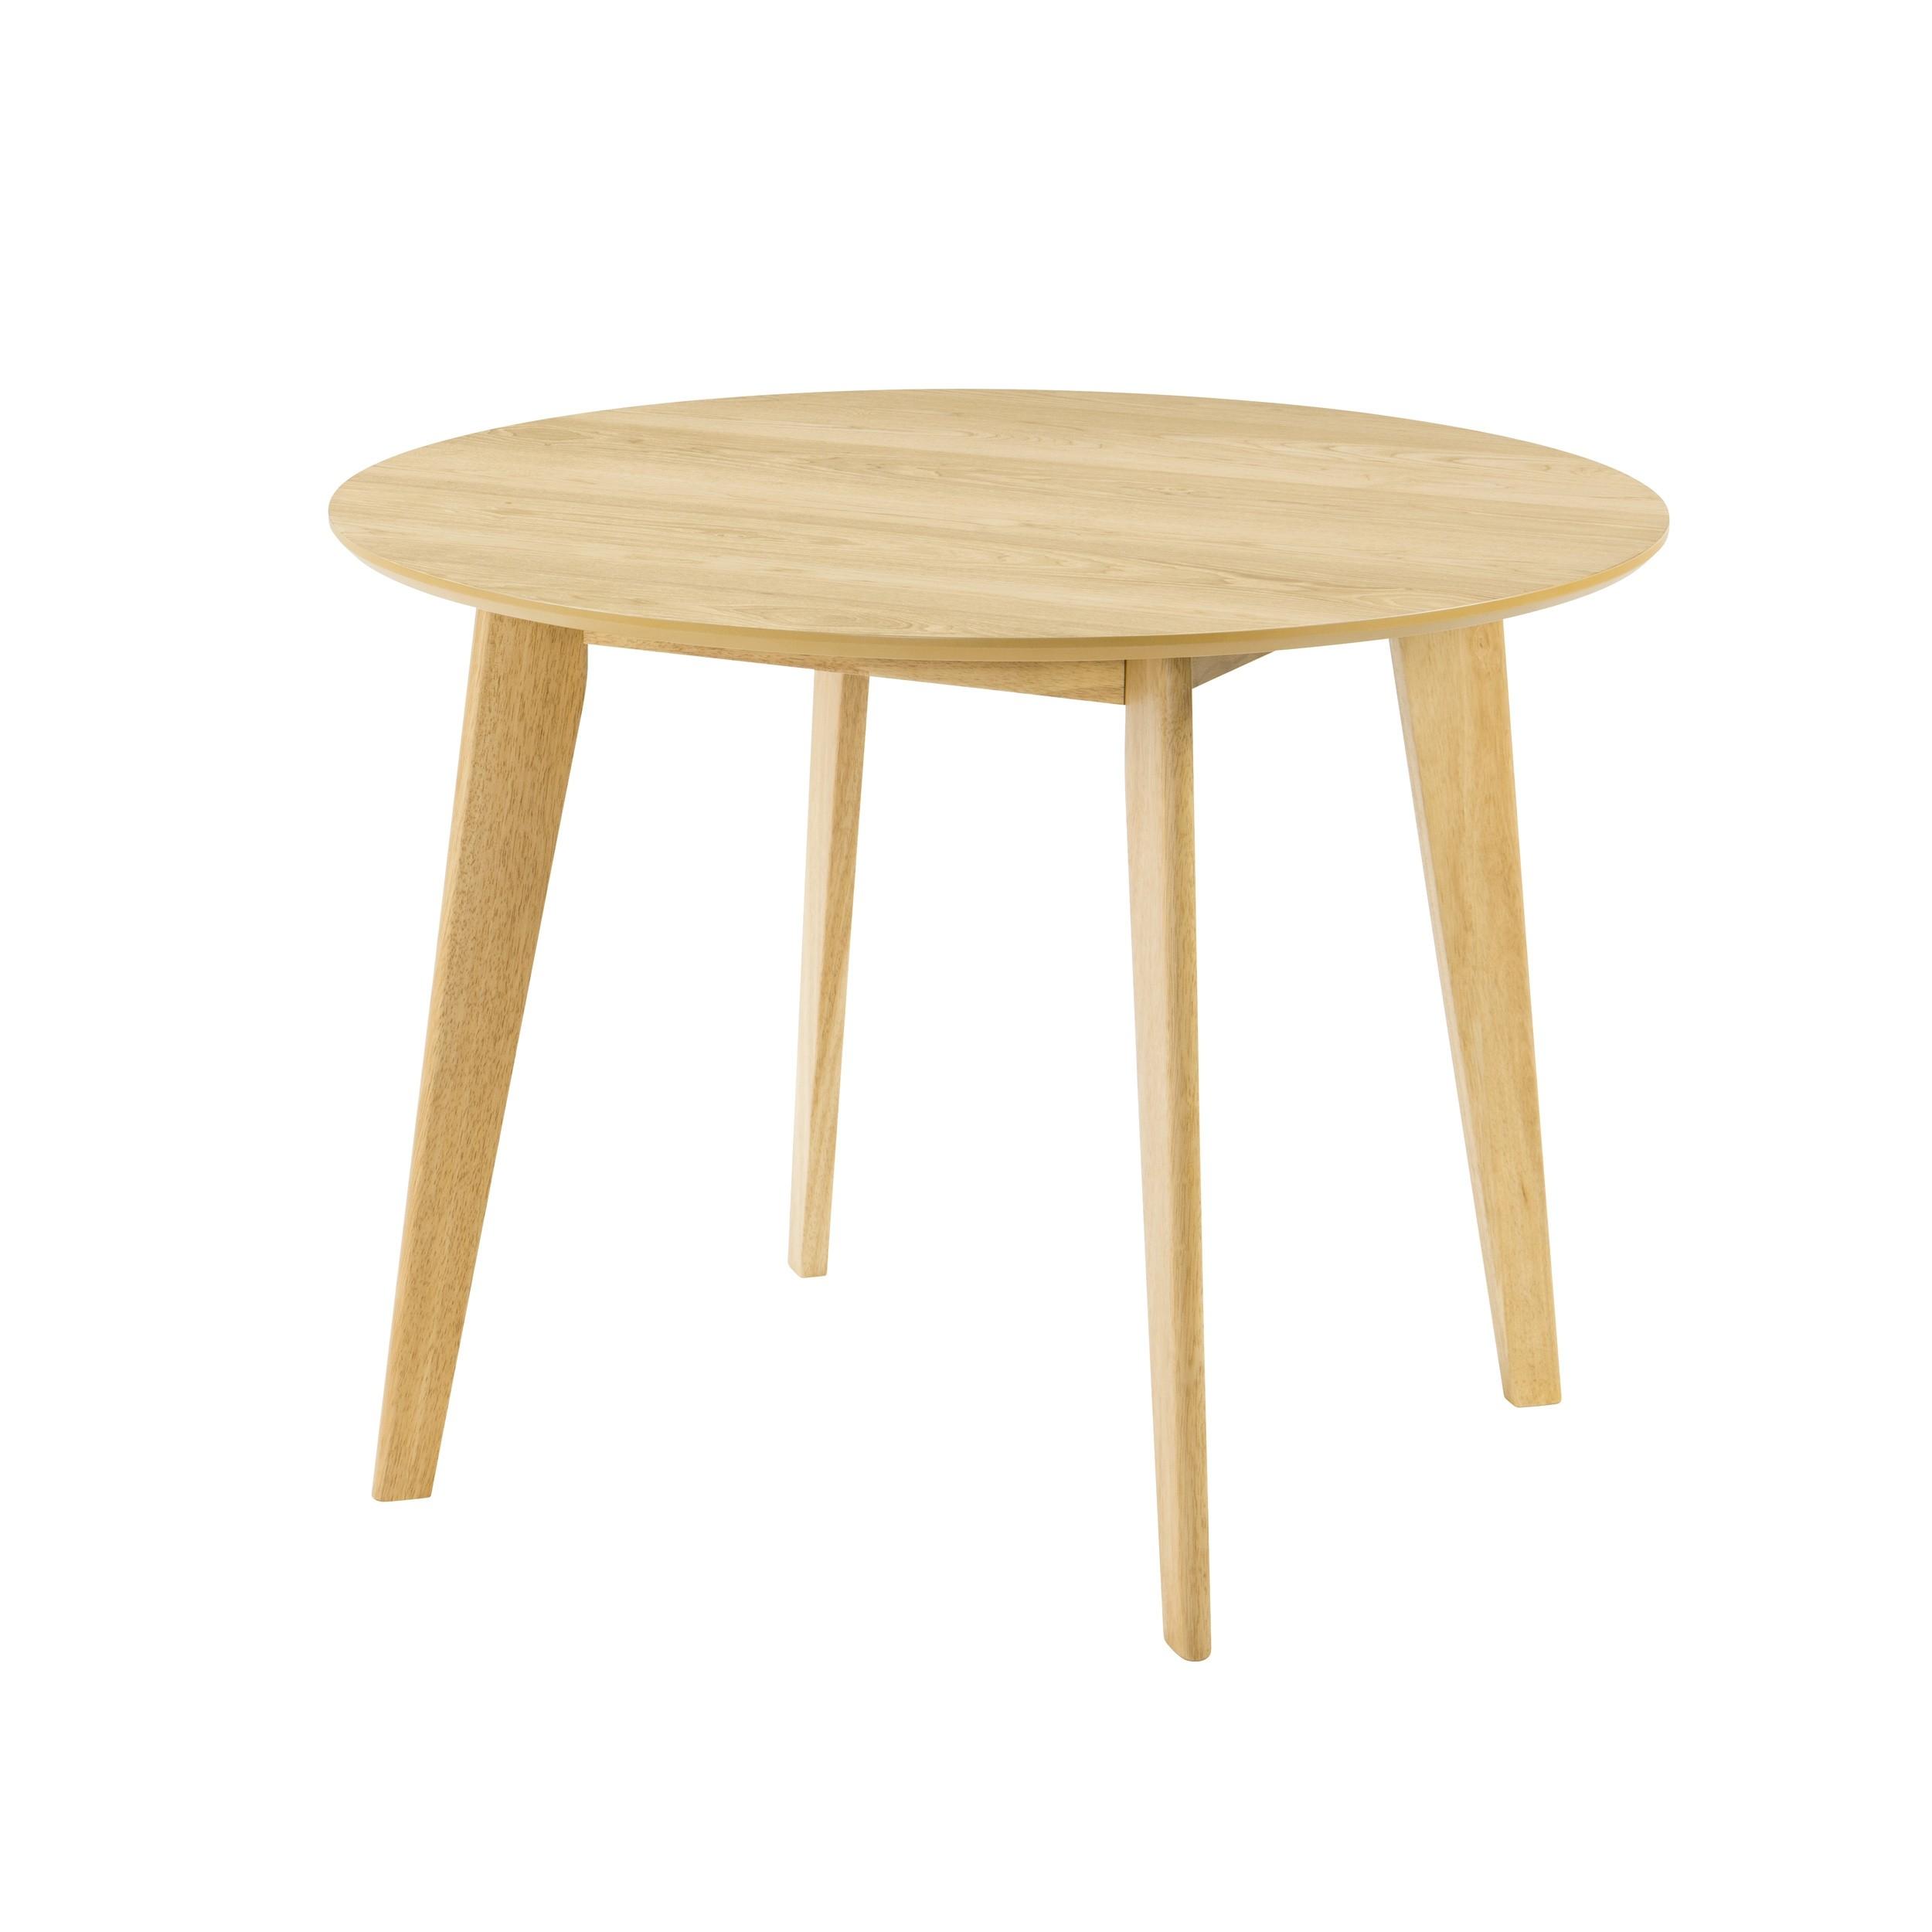 acheter table ronde de repas 100 cm